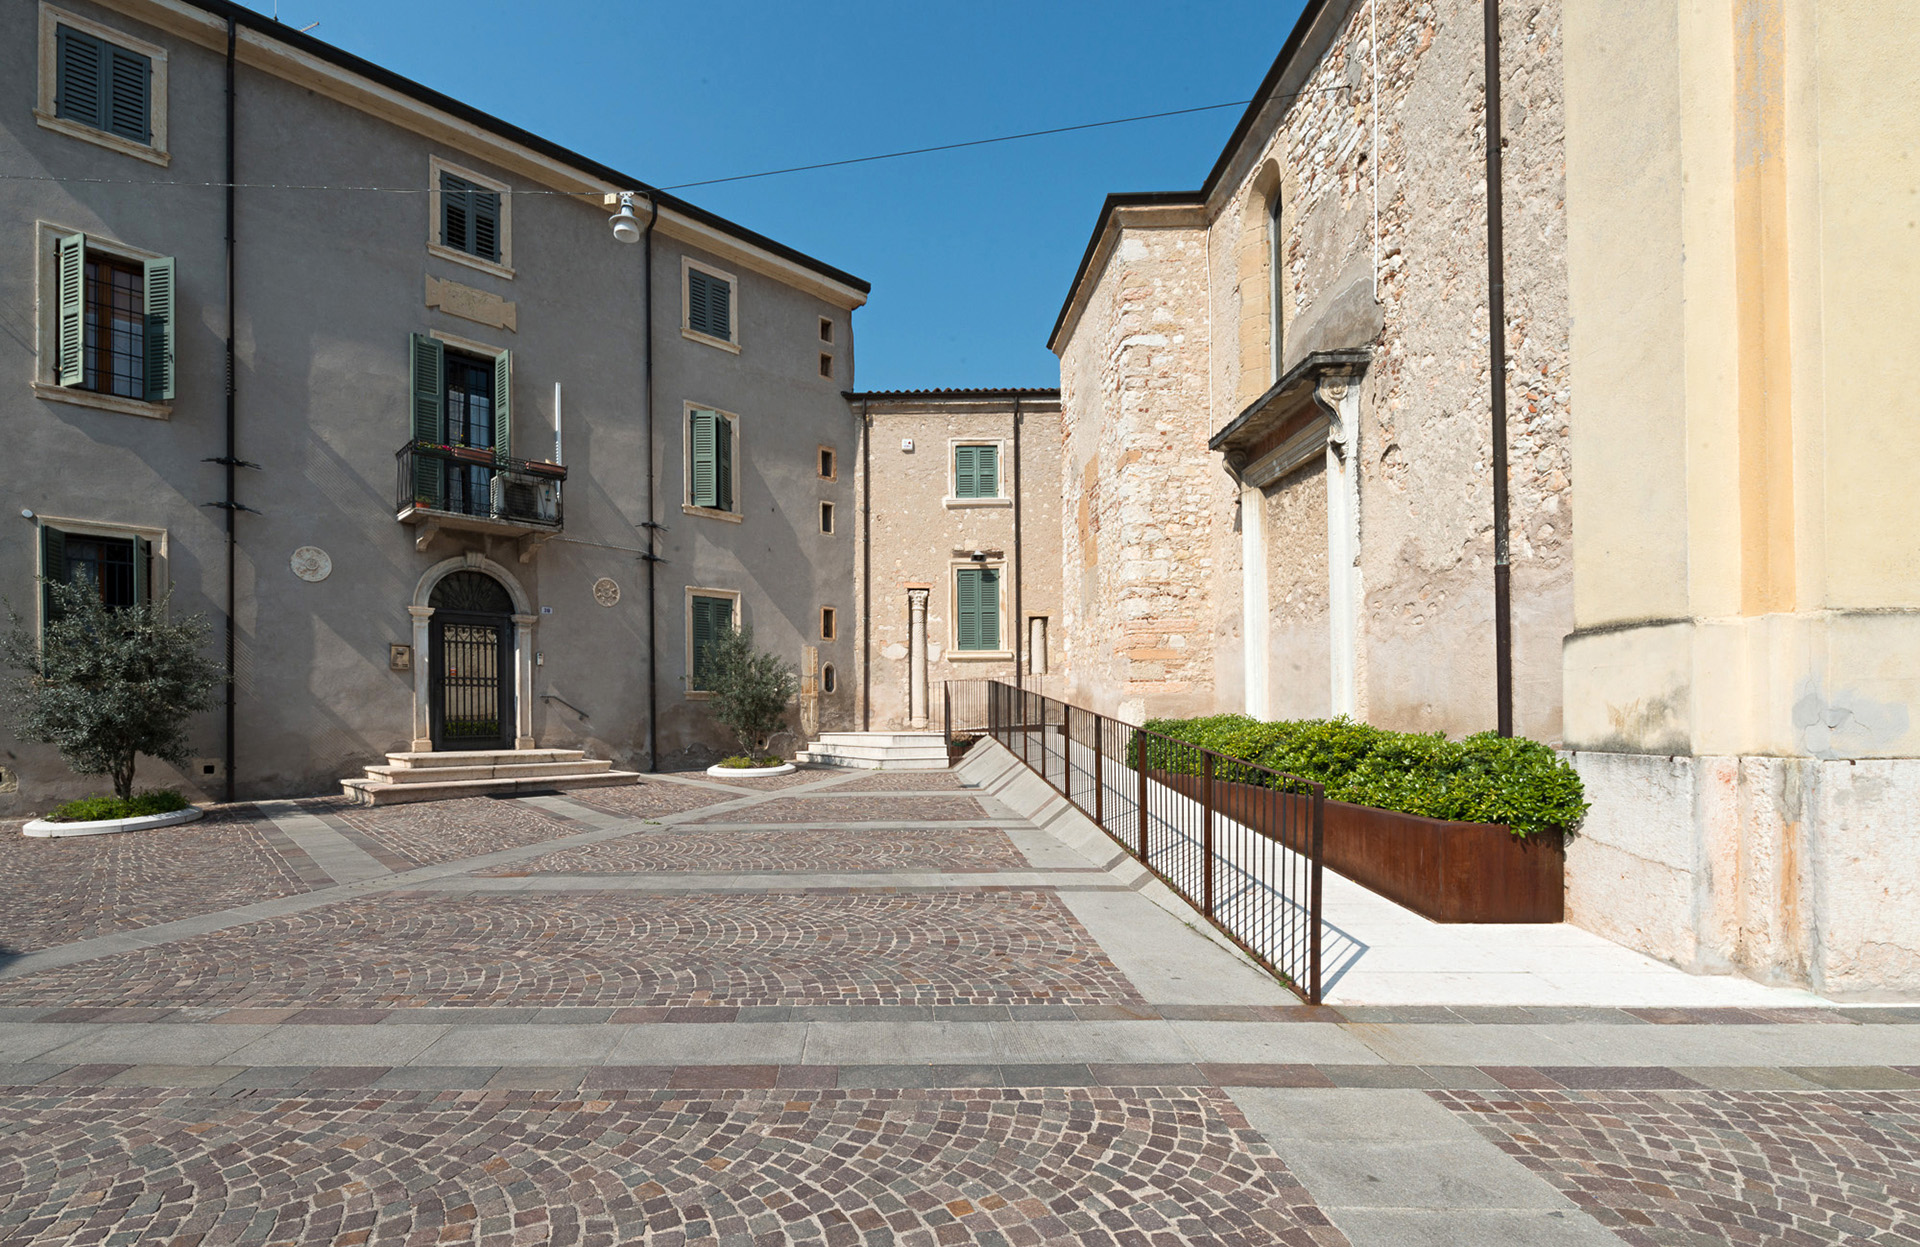 Piazza Spada Marzana